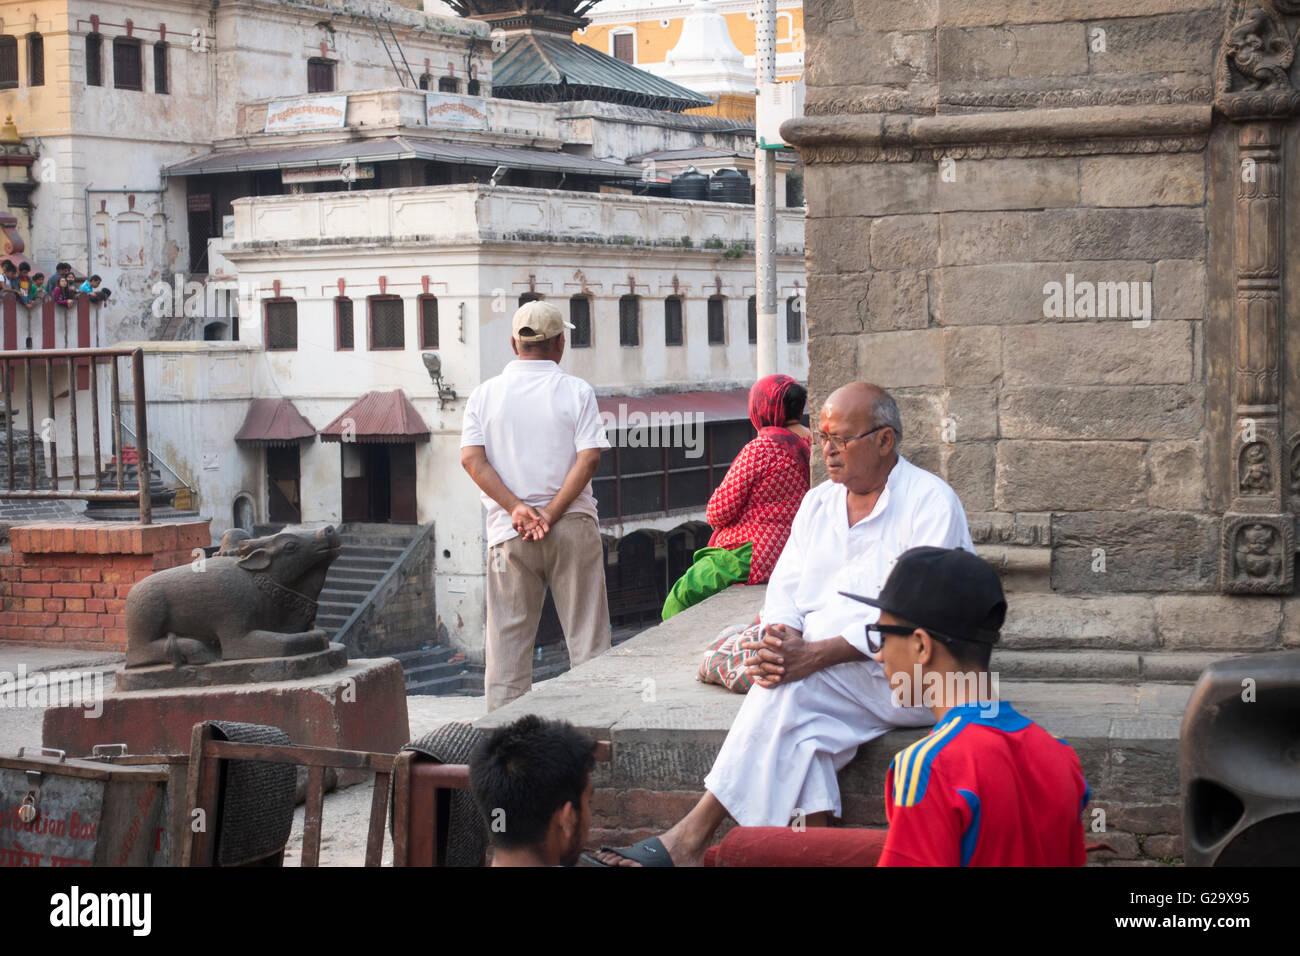 People outdoors at Pashupatinath Temple, sacred Hindu Temple, Kathmandu, Nepal - Stock Image